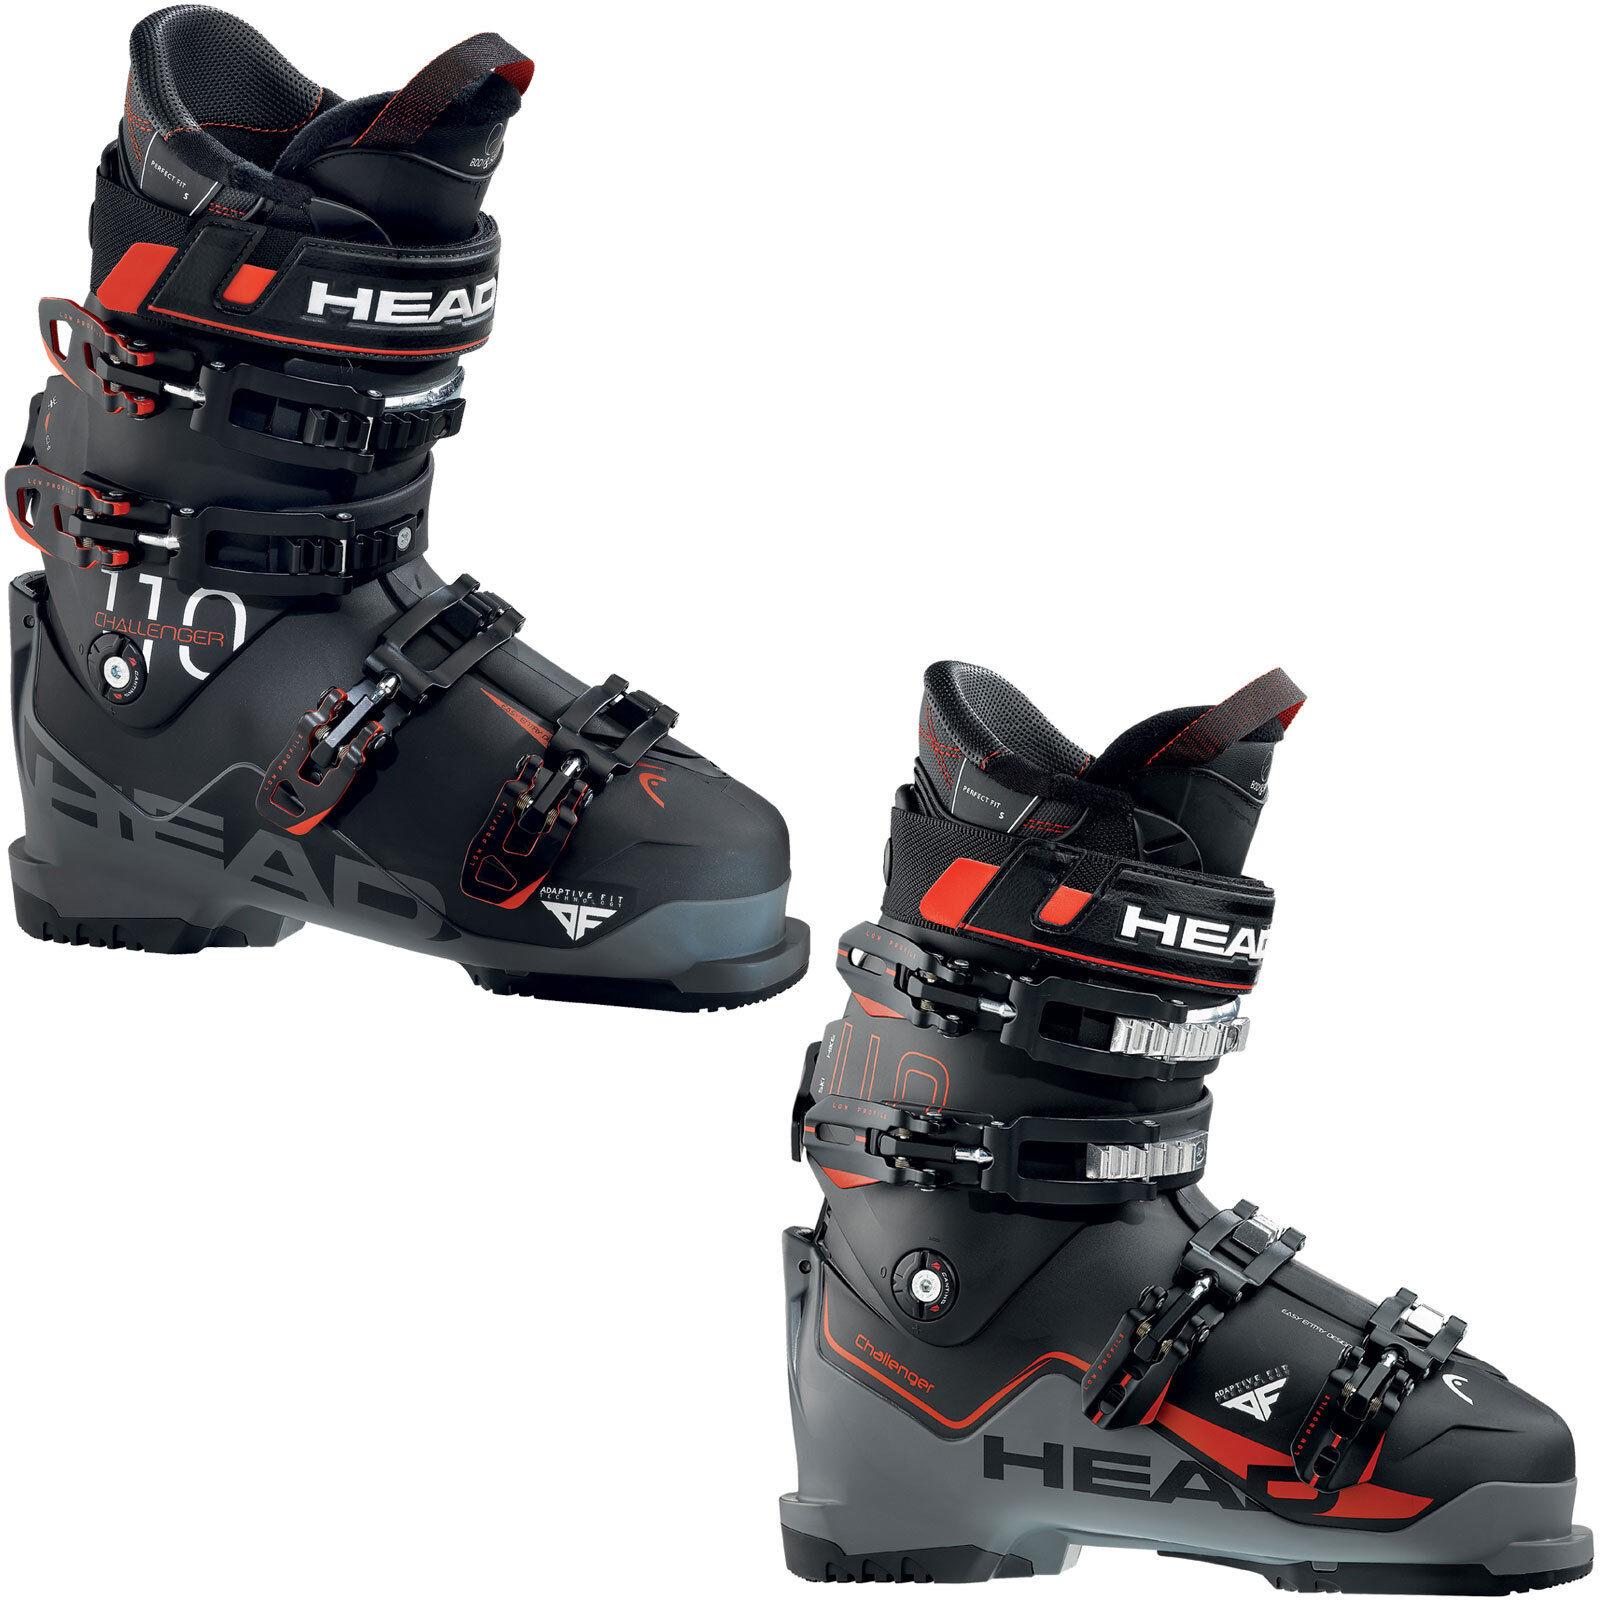 Head Challenger 110 Men's Ski Boots Ski Boots  4-schnallen Slope-Boots New  cheap designer brands